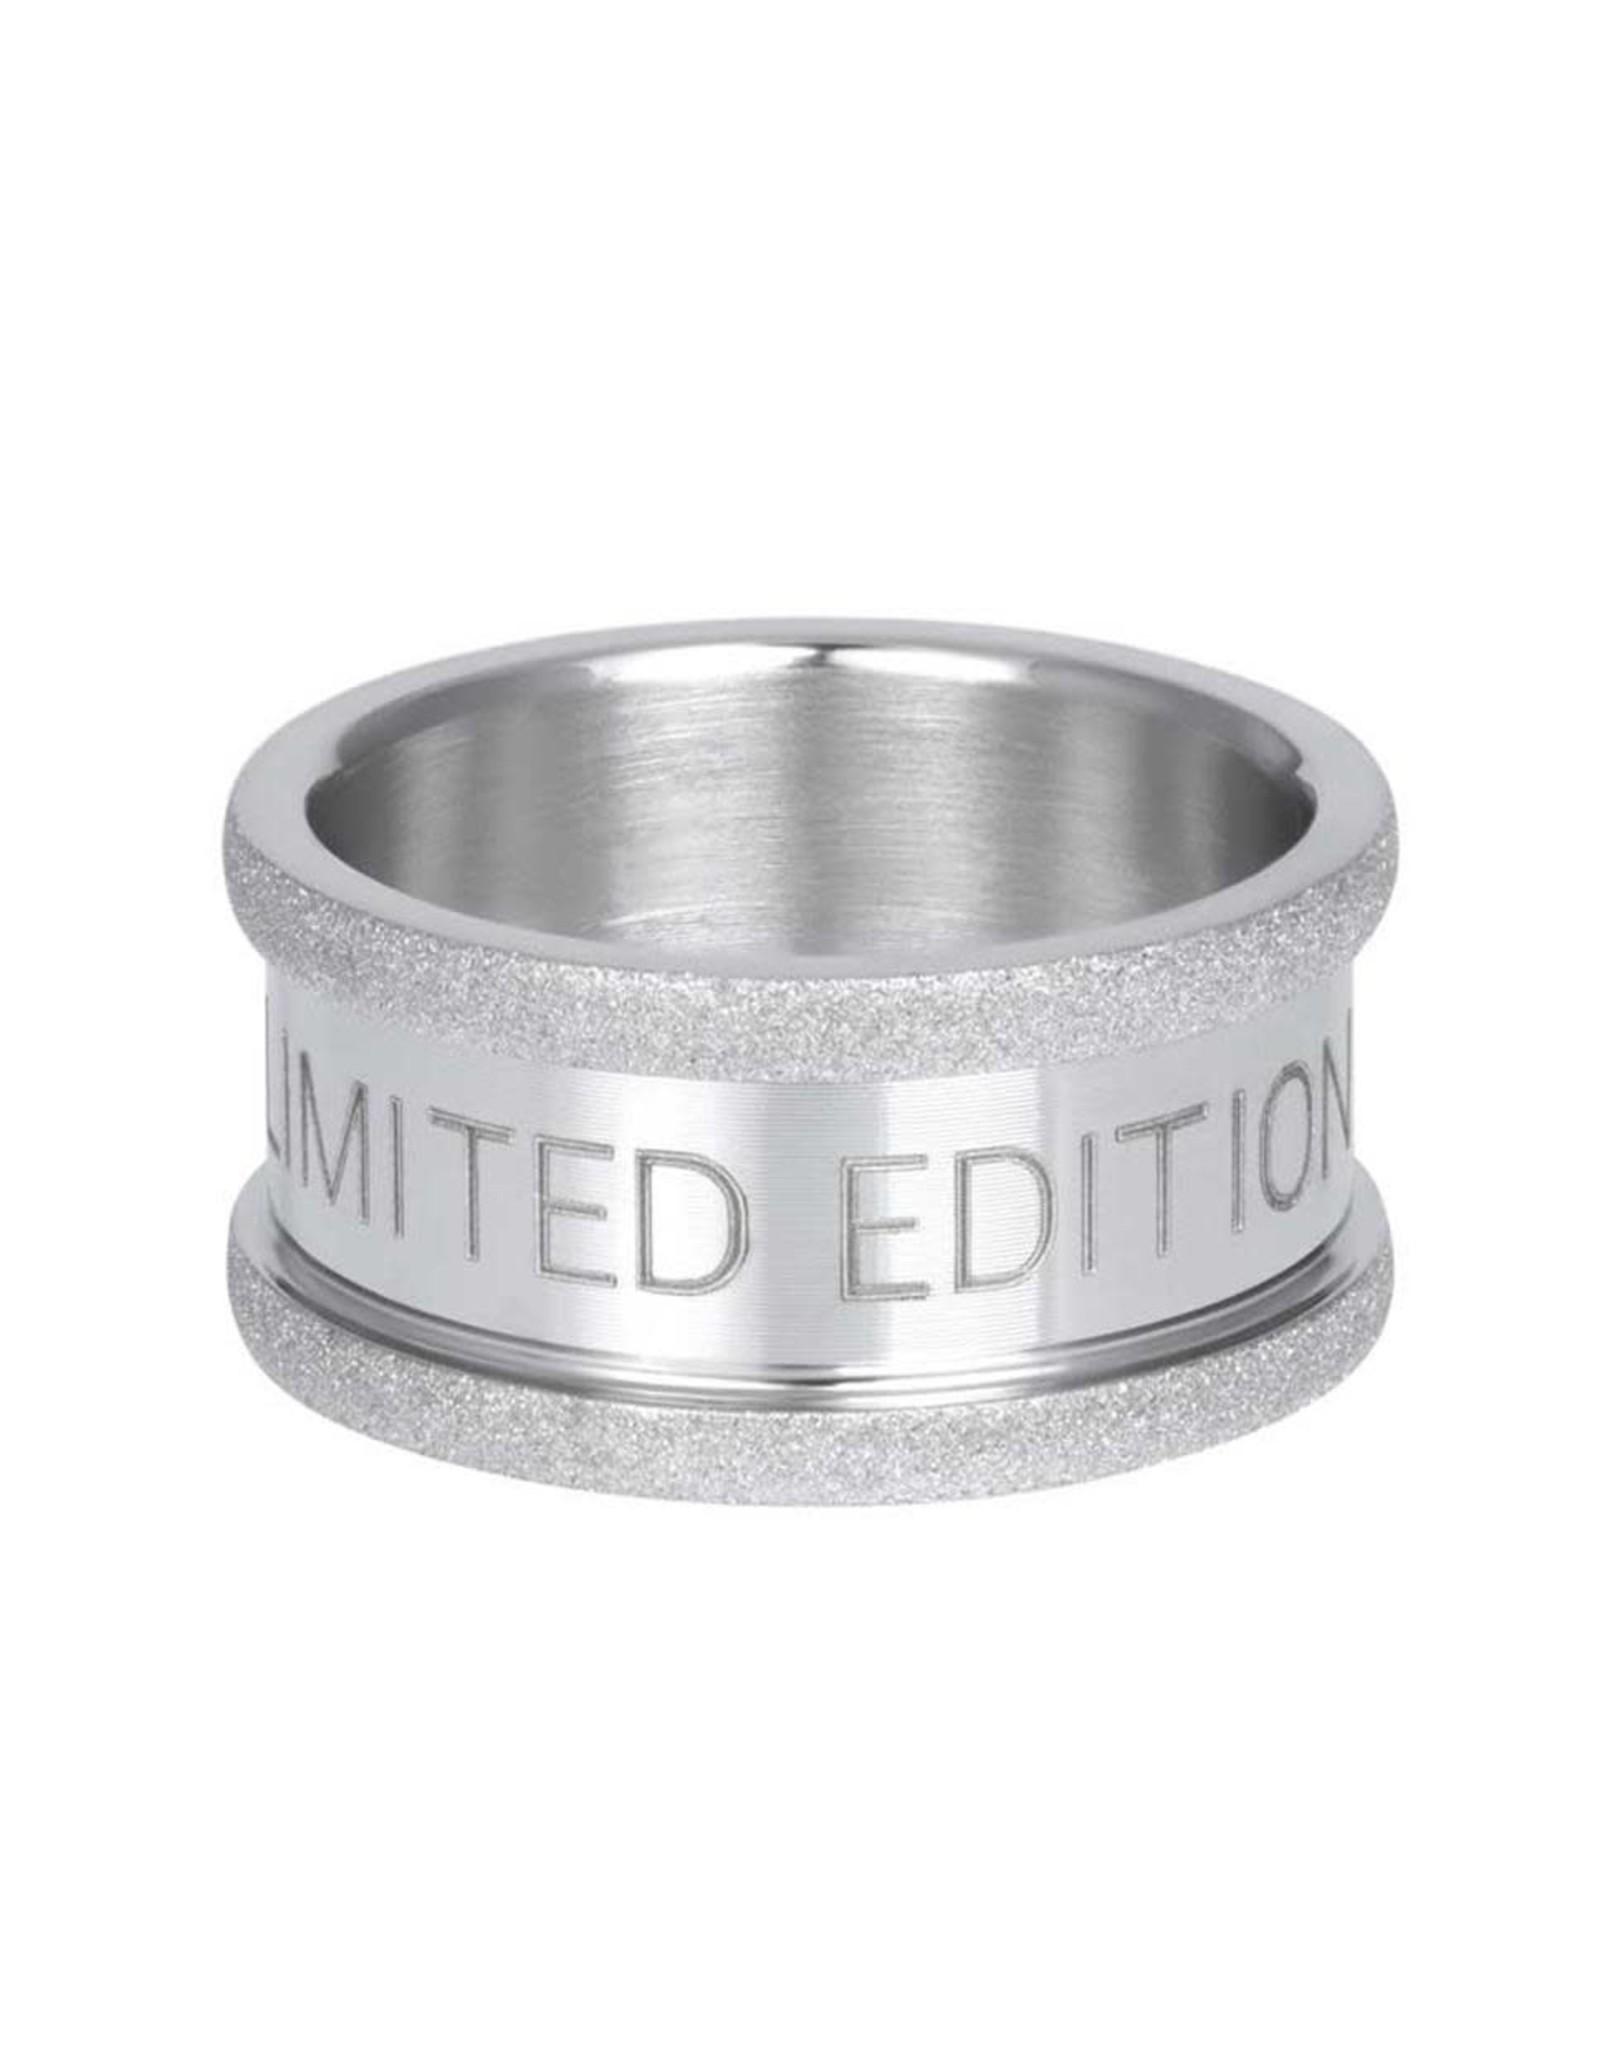 iXXXi Jewelry iXXXi basishuls Limited Edition 10 mm